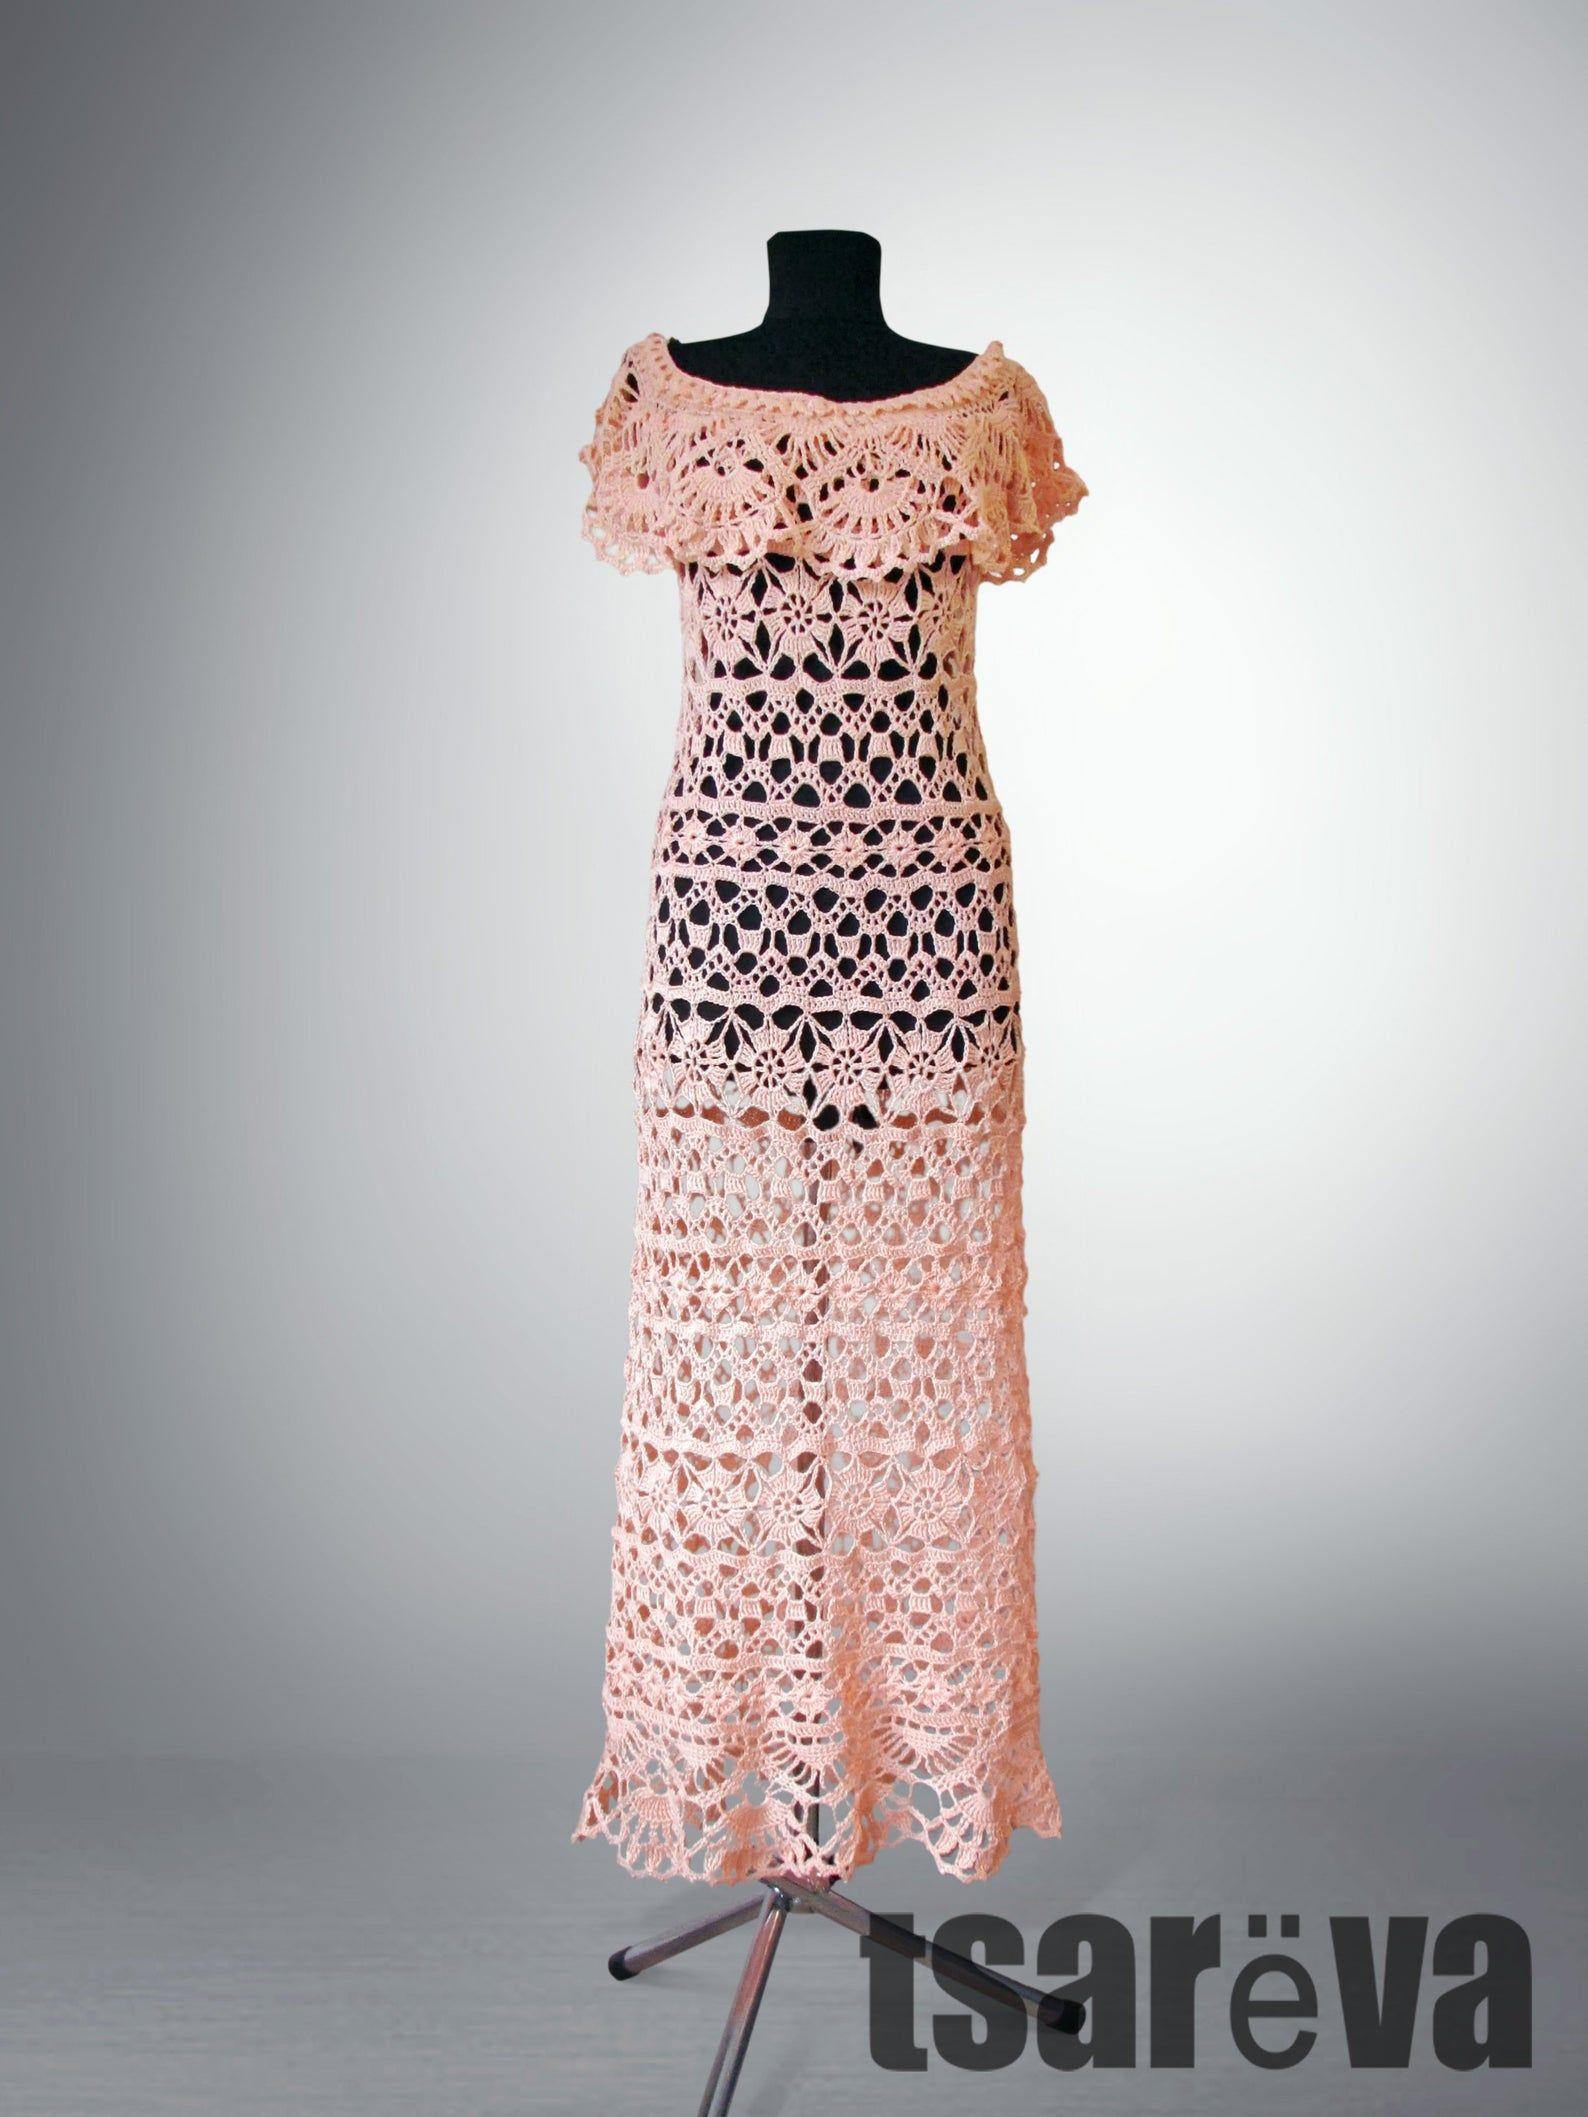 Gehaakte jurk Rachel. Witte delicate charme vrouwen bloem